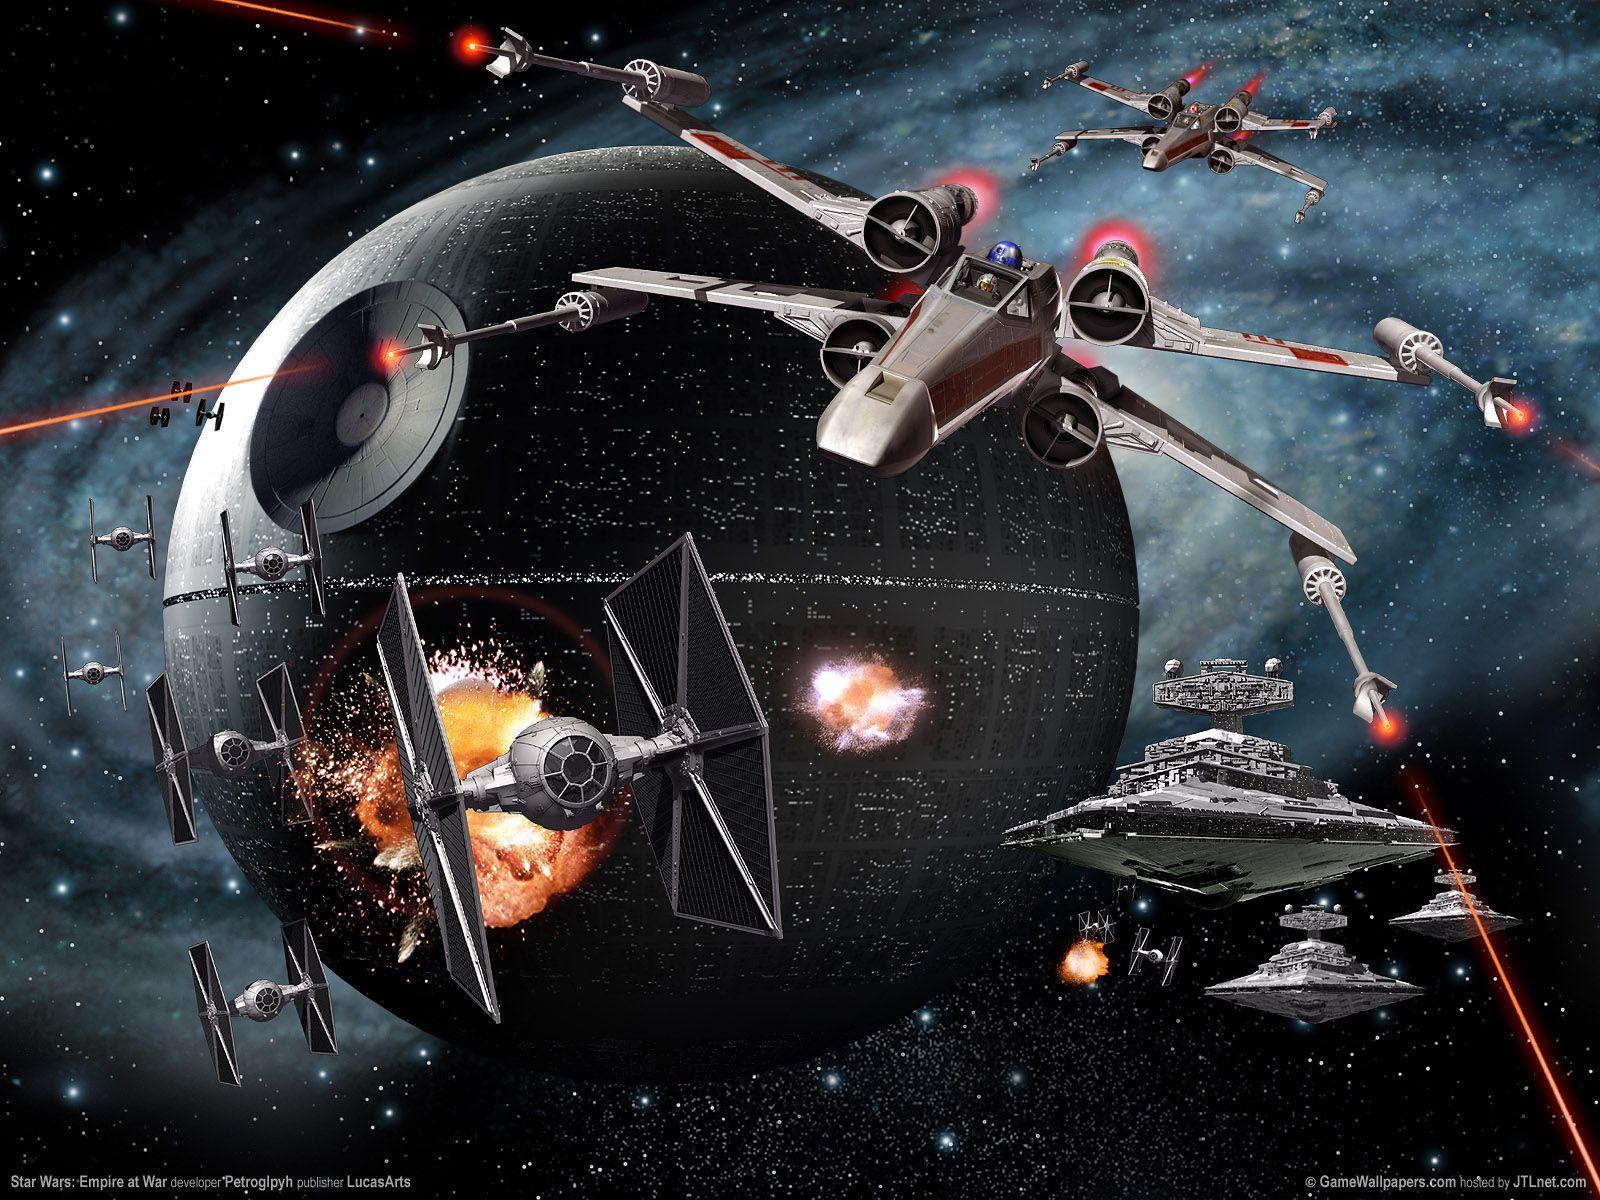 star wars | star wars ponderings- twl #39 | fangirl's closet